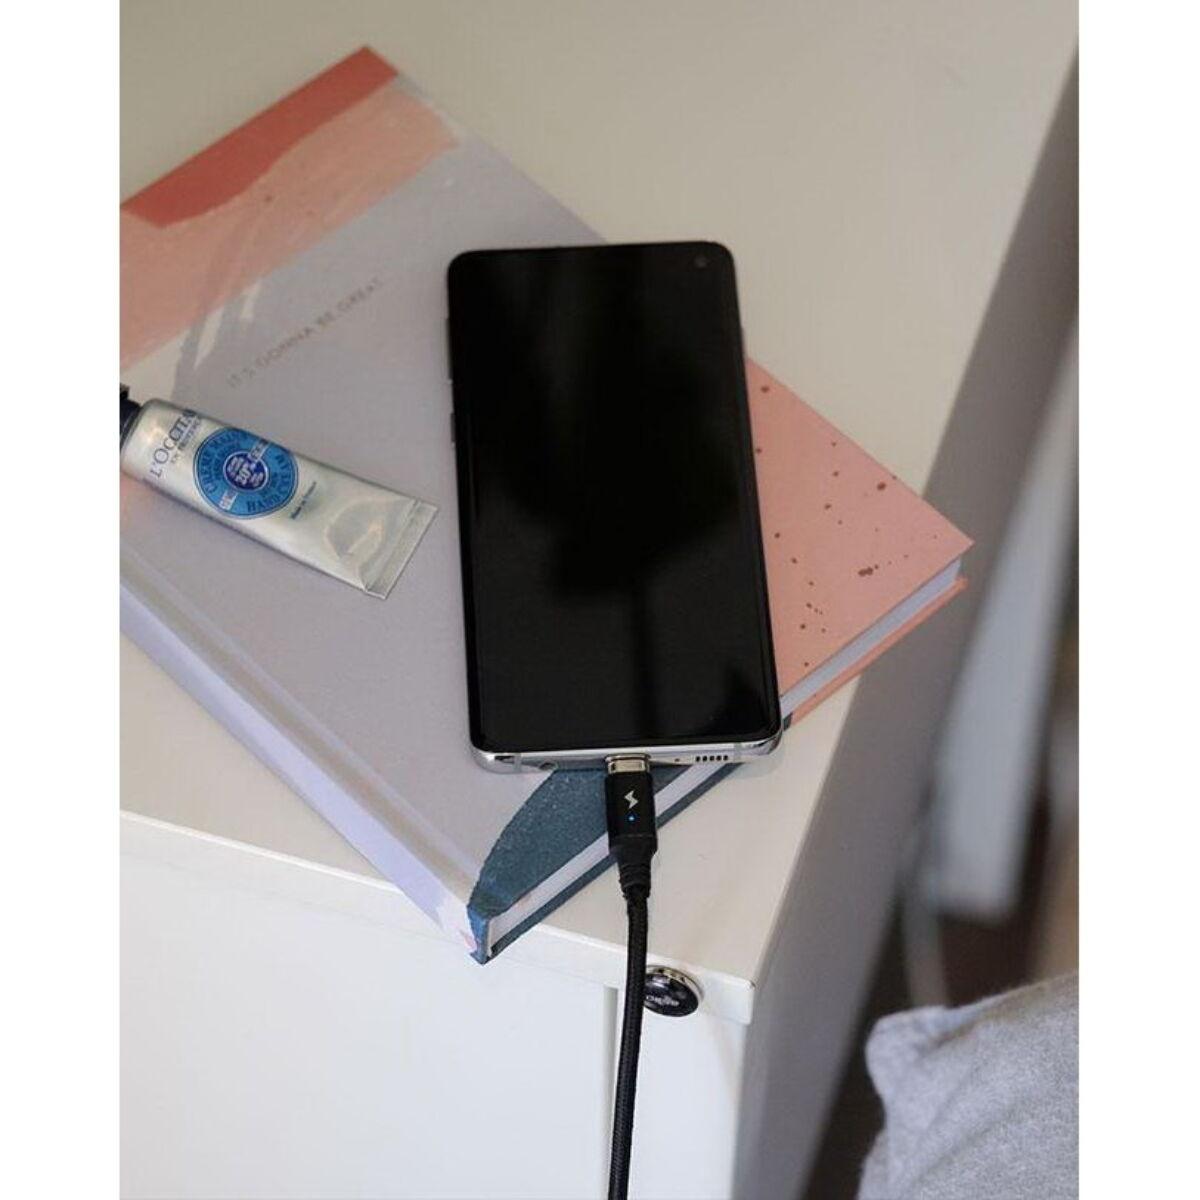 Chargeasap Mágneses kábelrendező, 4 db/csomag, fekete